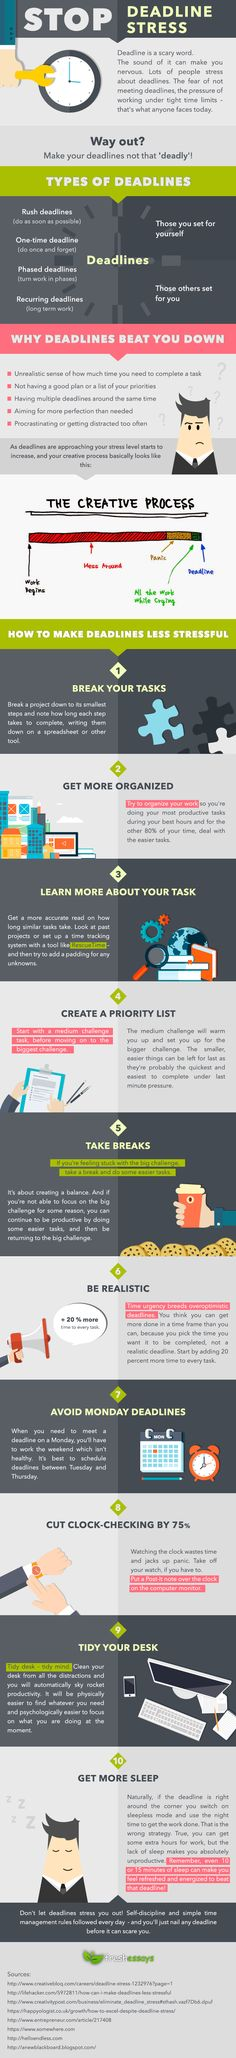 Stop Deadline Stress #Infographic #Stress